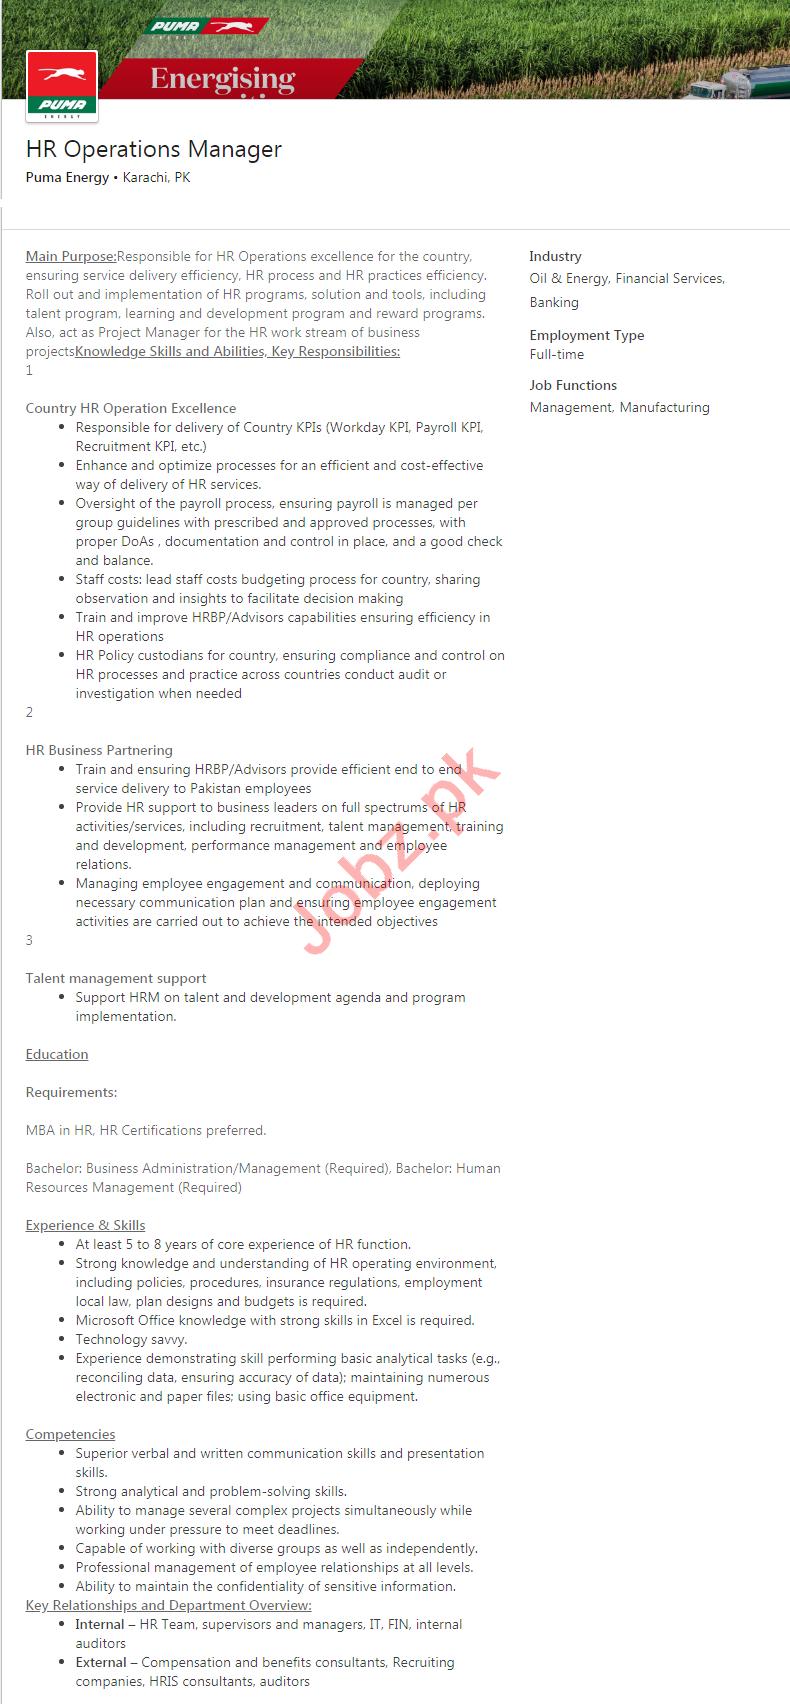 Puma Energy Karachi Jobs 2020 for HR Operations Manager